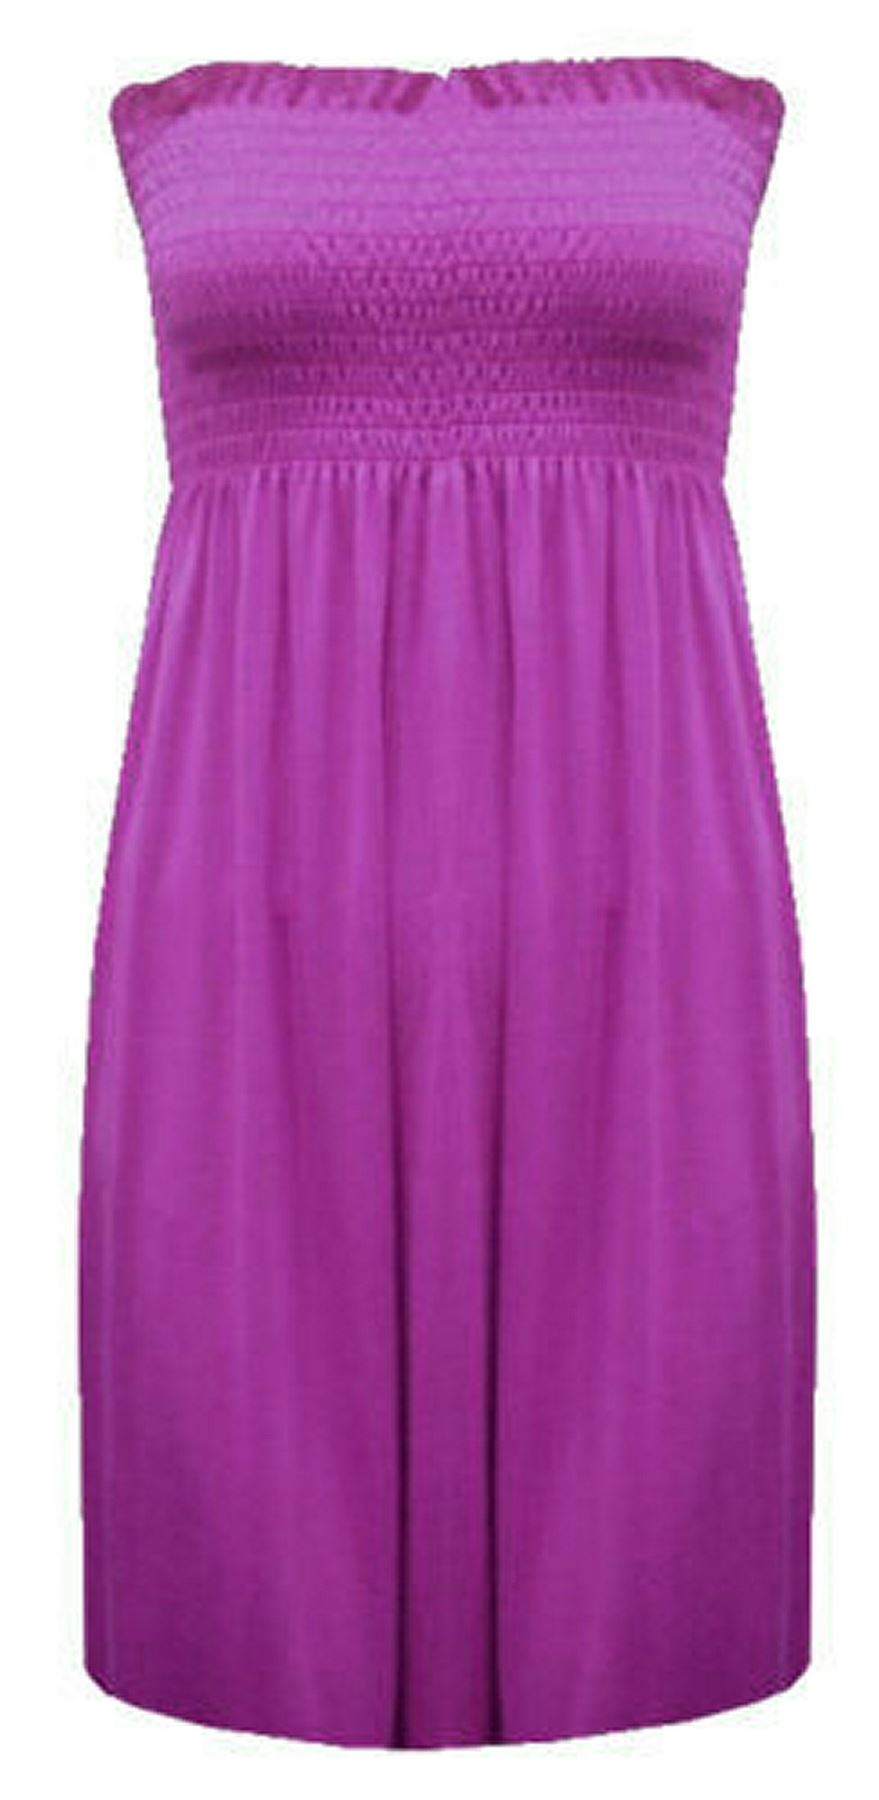 New-Ladies-Bandeau-Boob-Gathering-Tops-Boob-Tube-Beach-Wear-Tunics-8-26 thumbnail 55